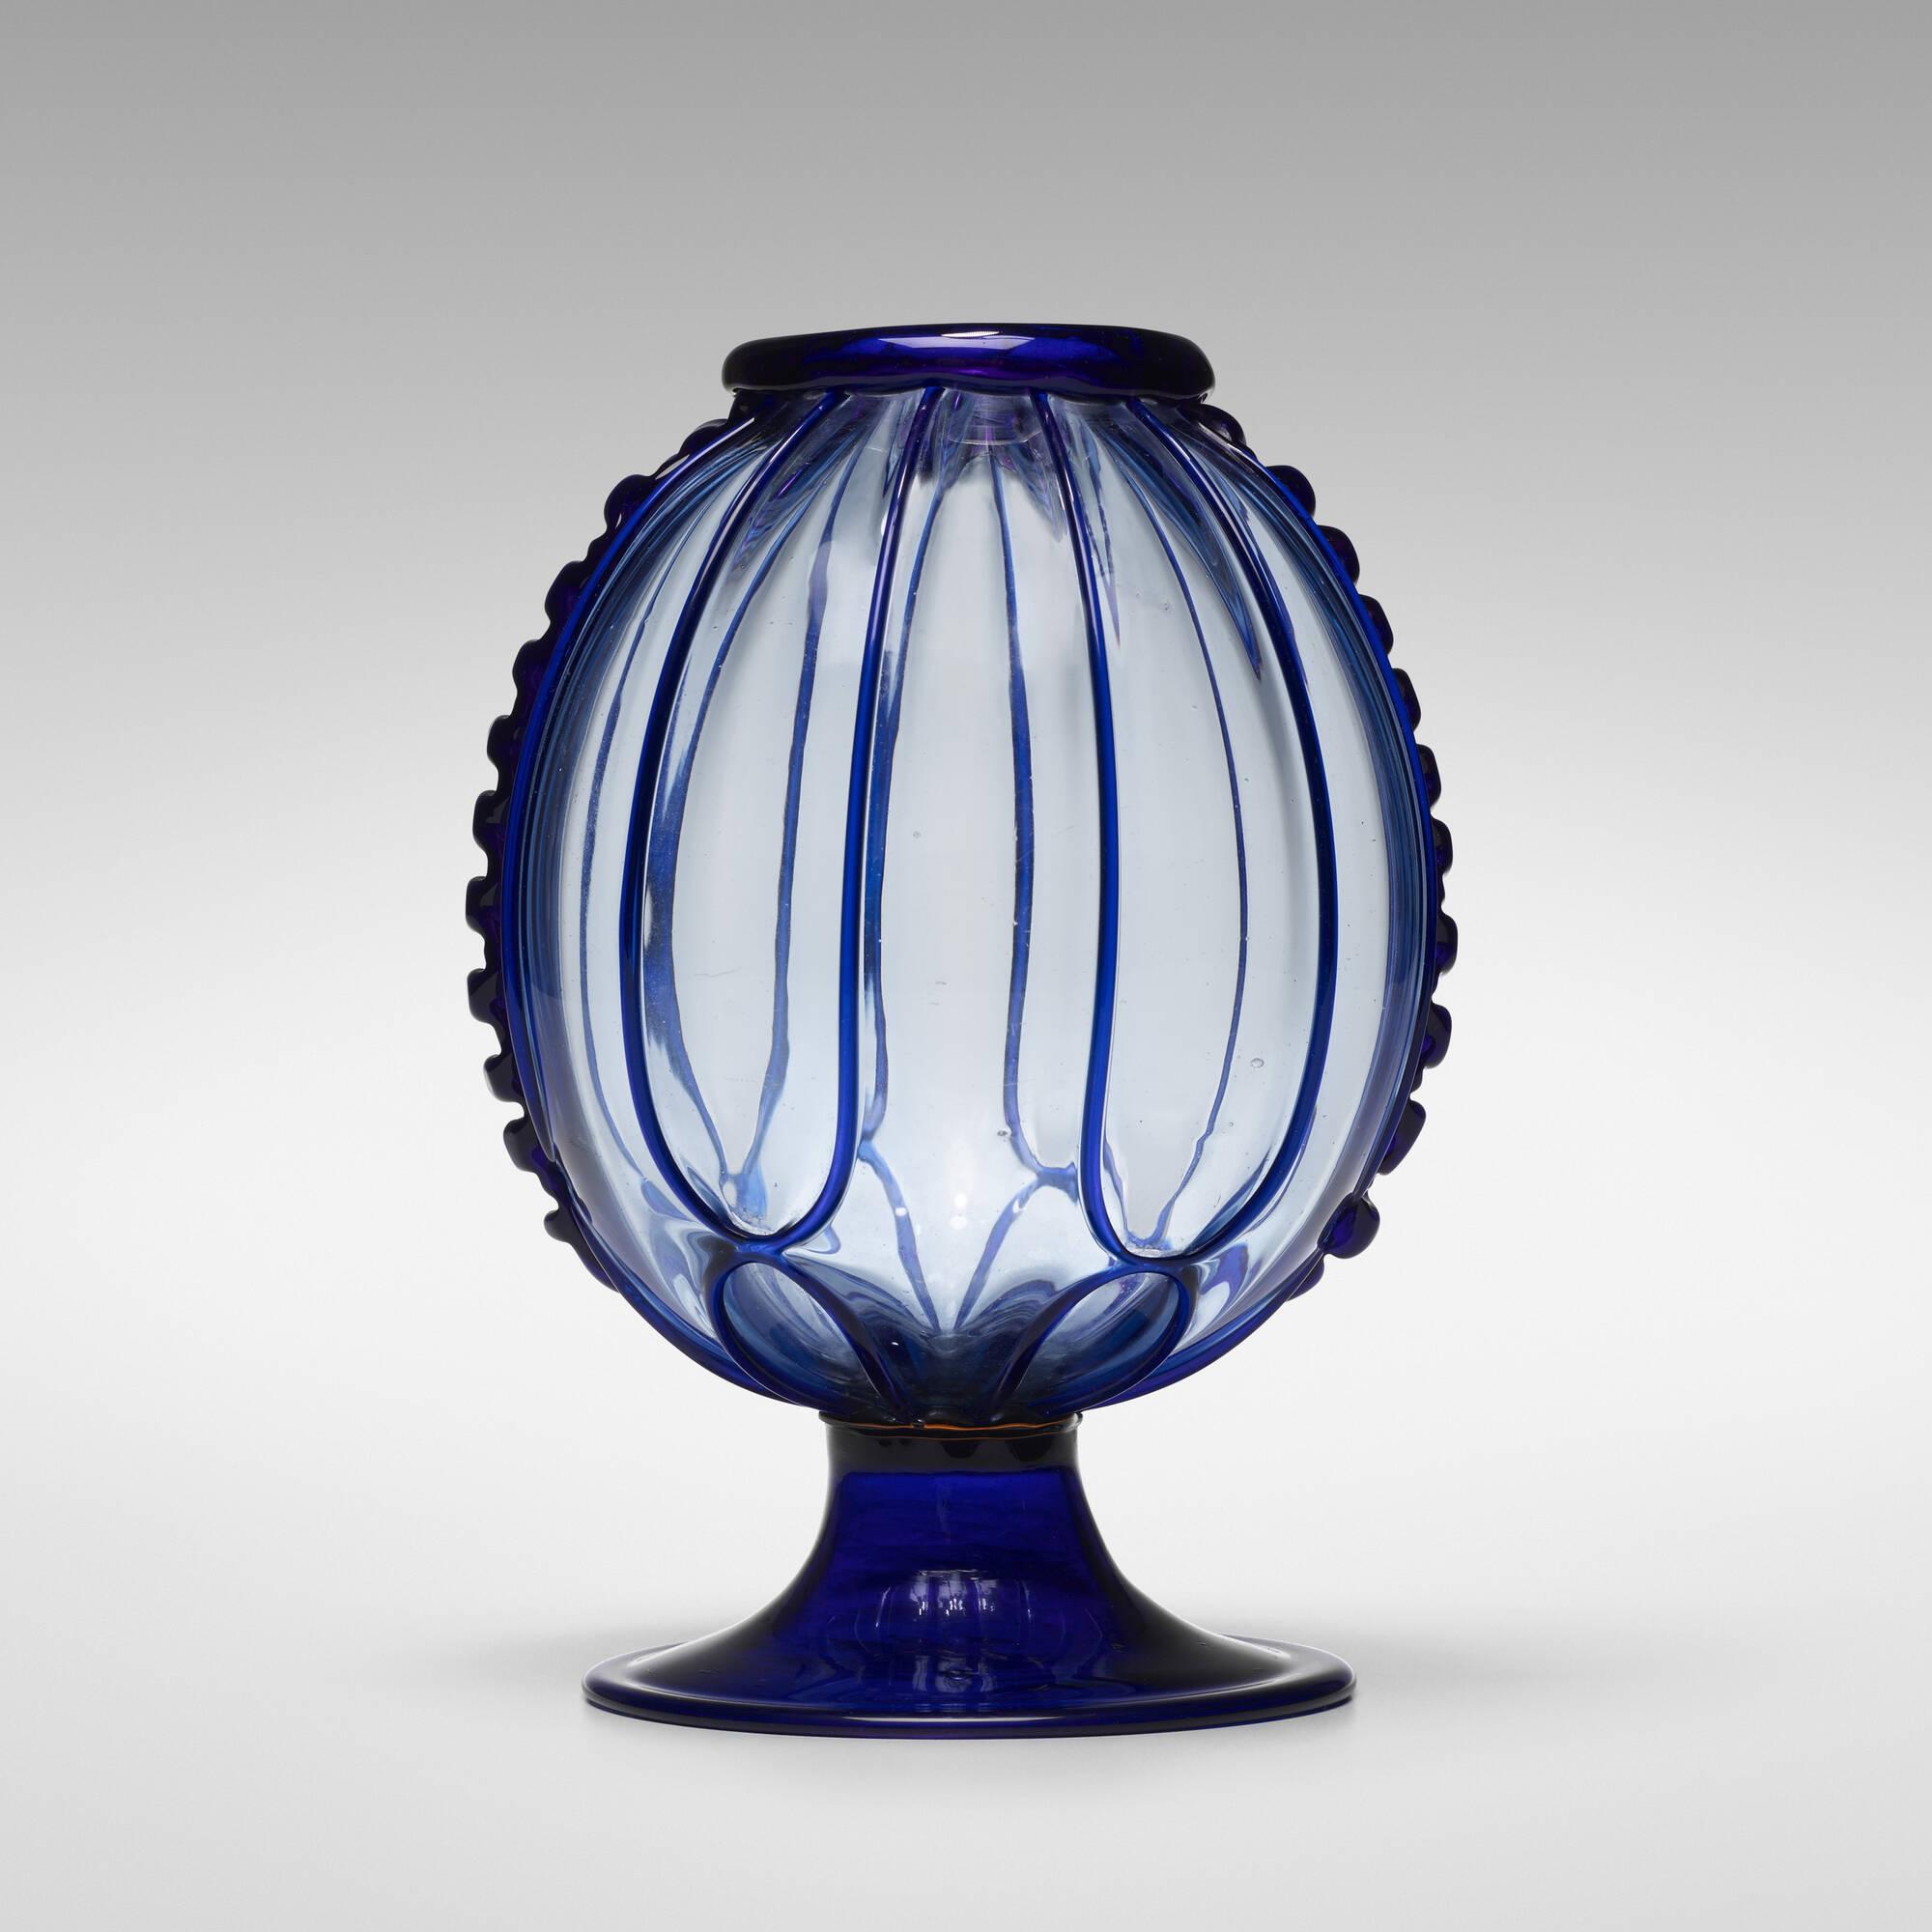 105: Artistica Barovier, attribution / Soffiato vase (1 of 2)